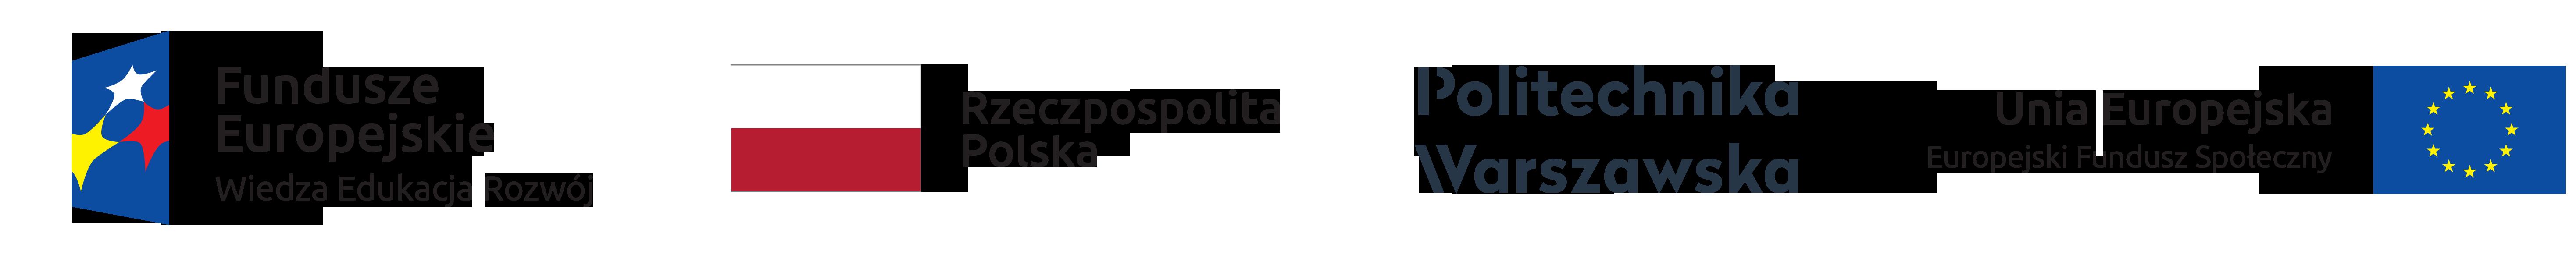 Logo Politechnika Fundusz Europejski